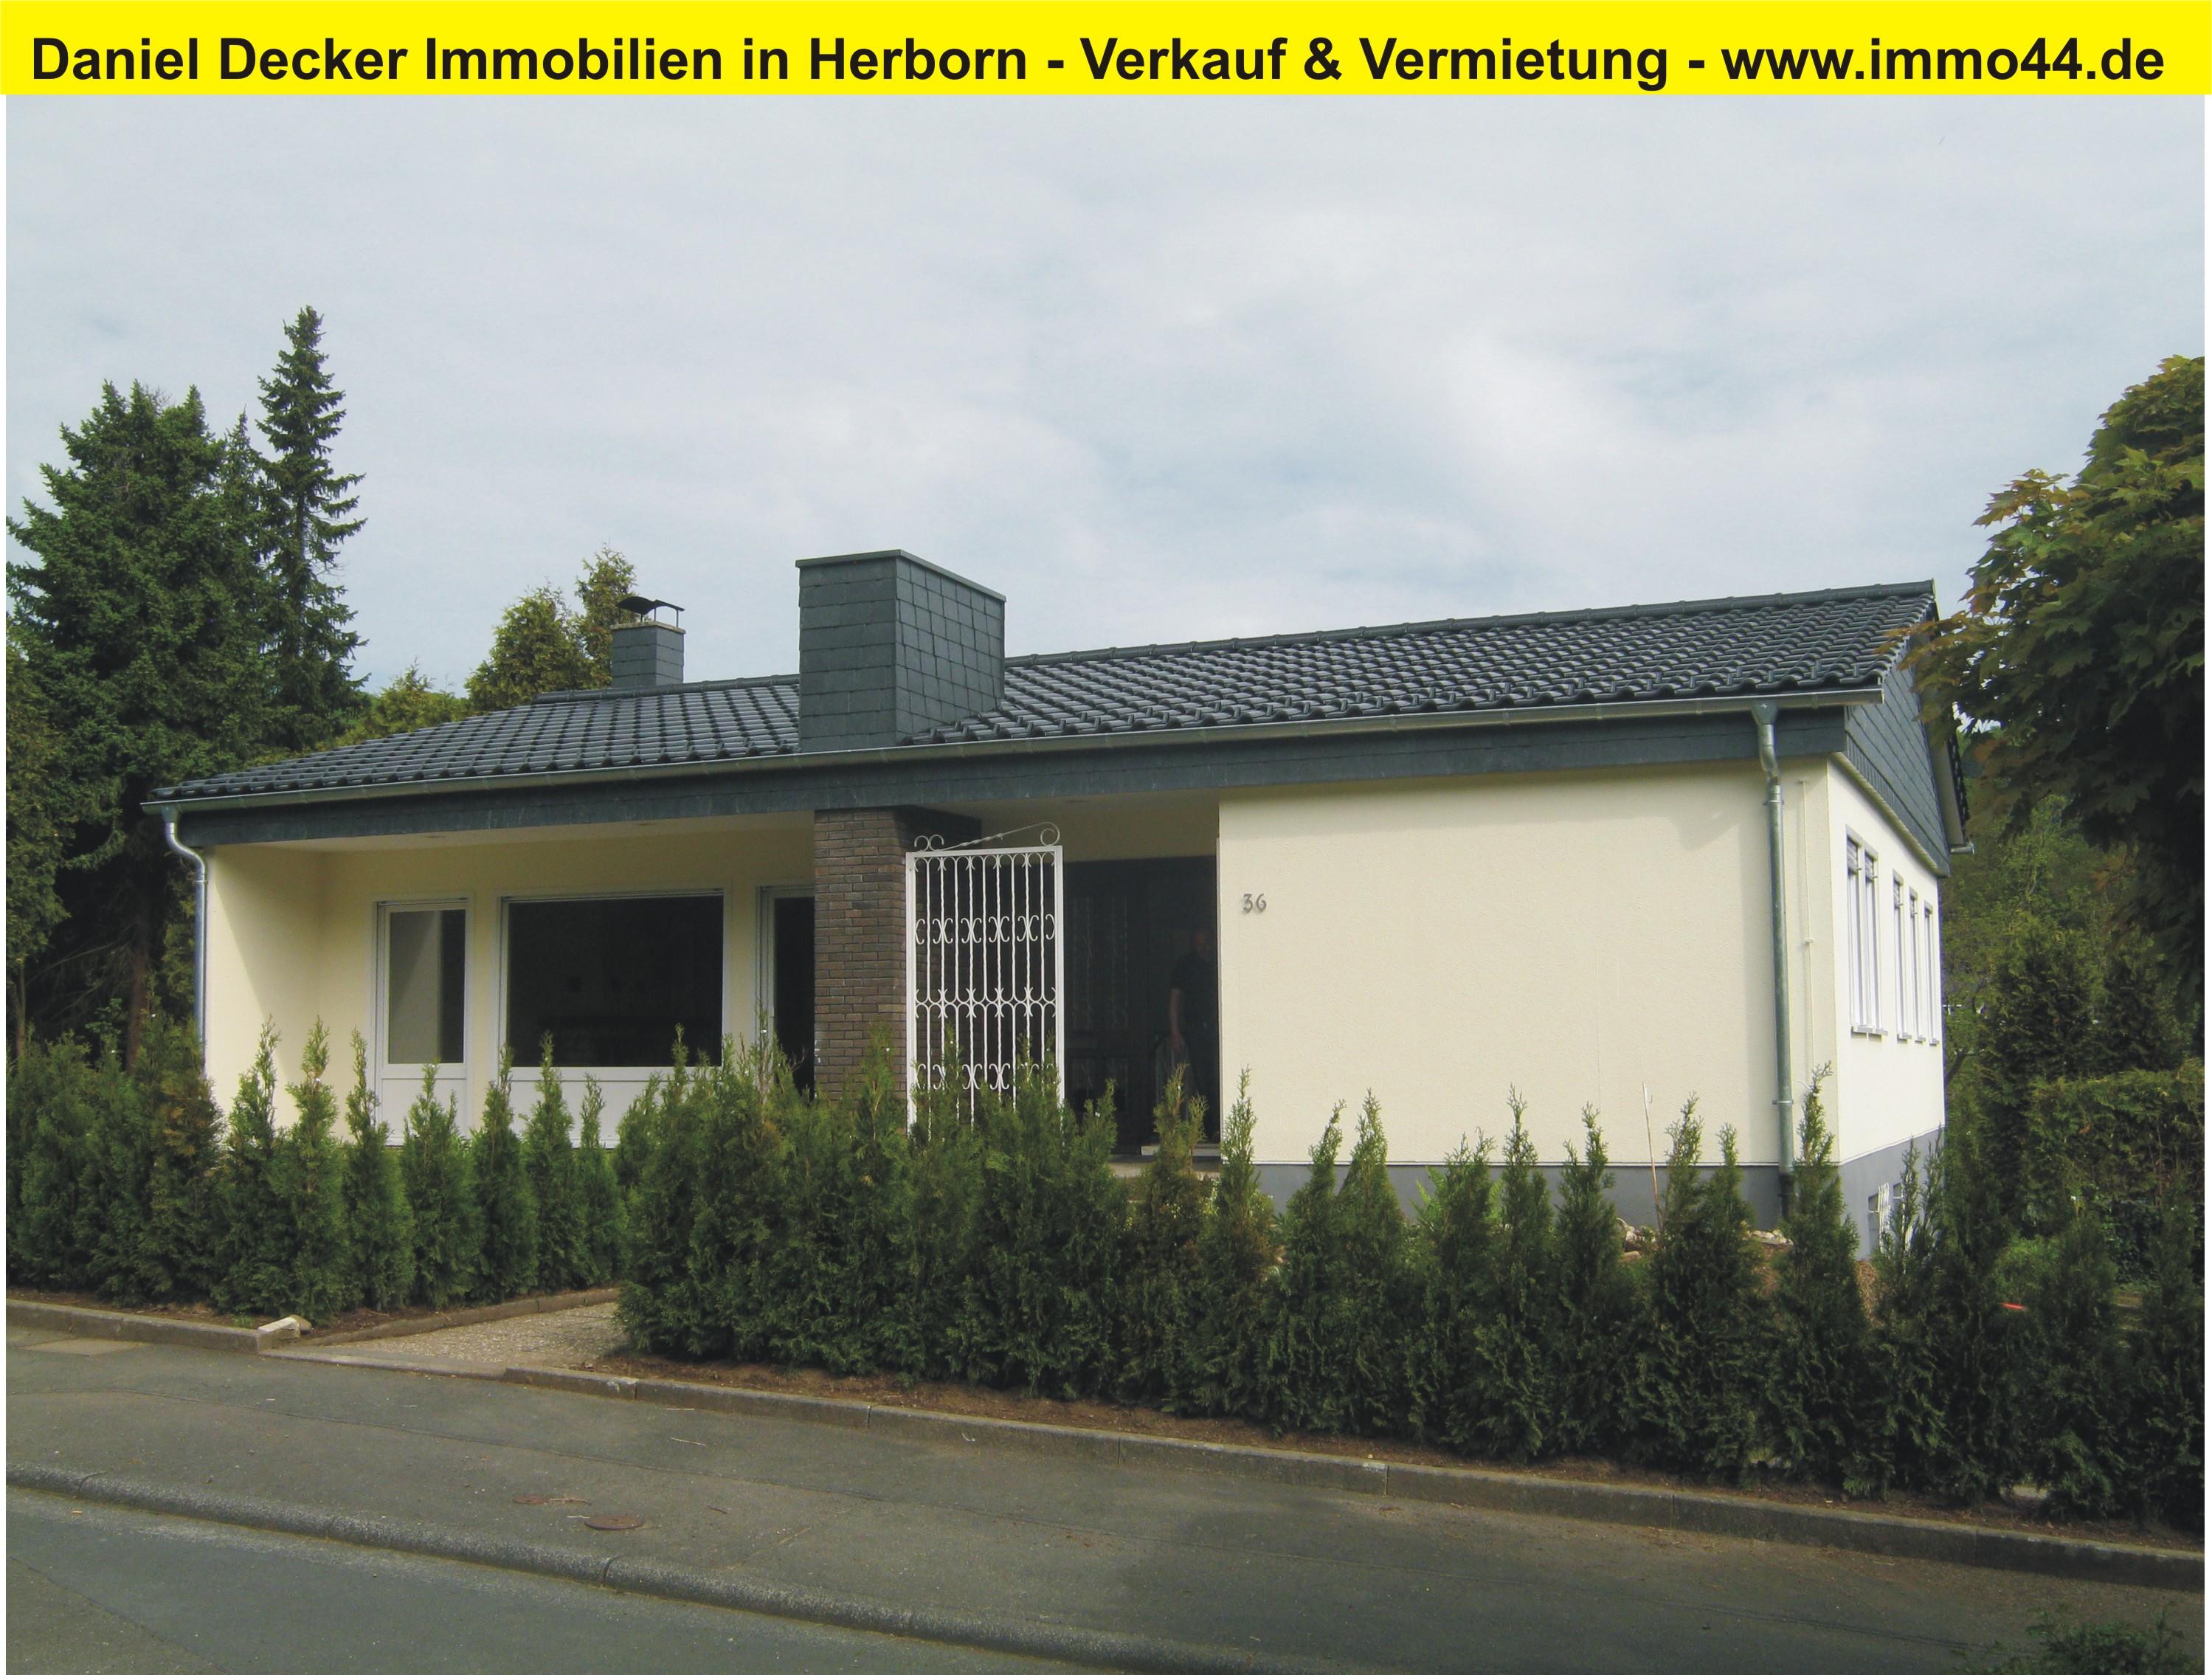 Decker Immobilien daniel decker immobilien herborn immo44 de